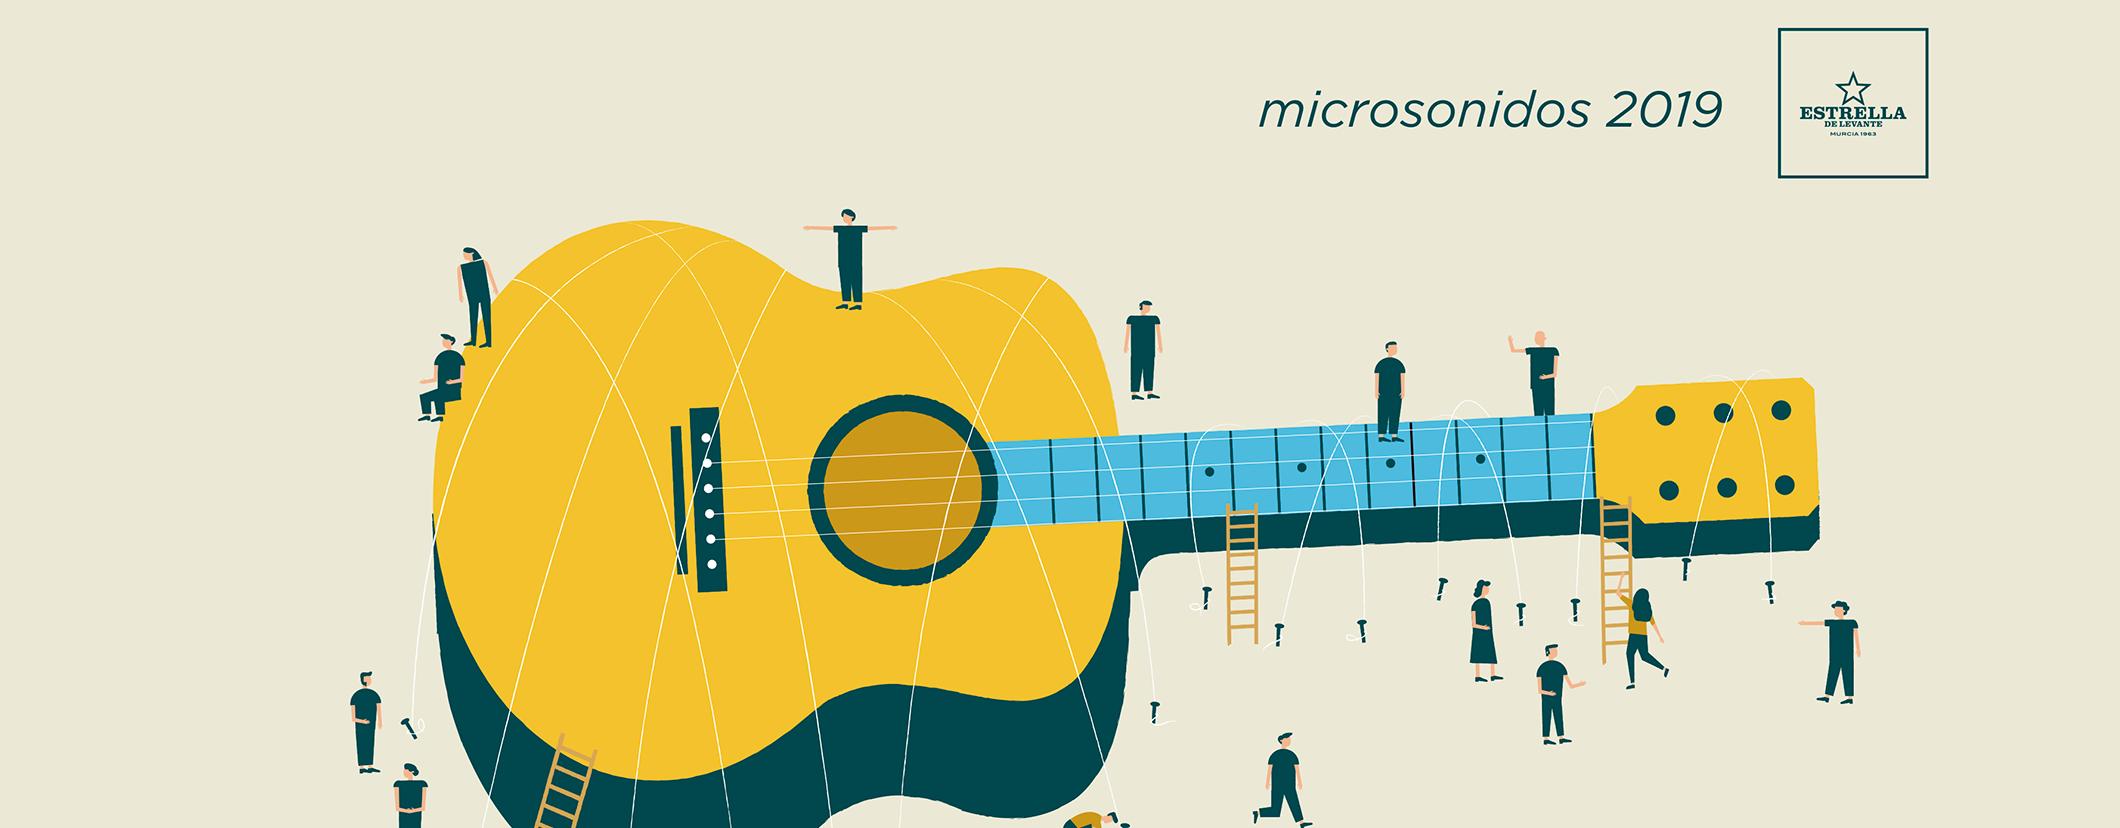 Microsonidos 2019